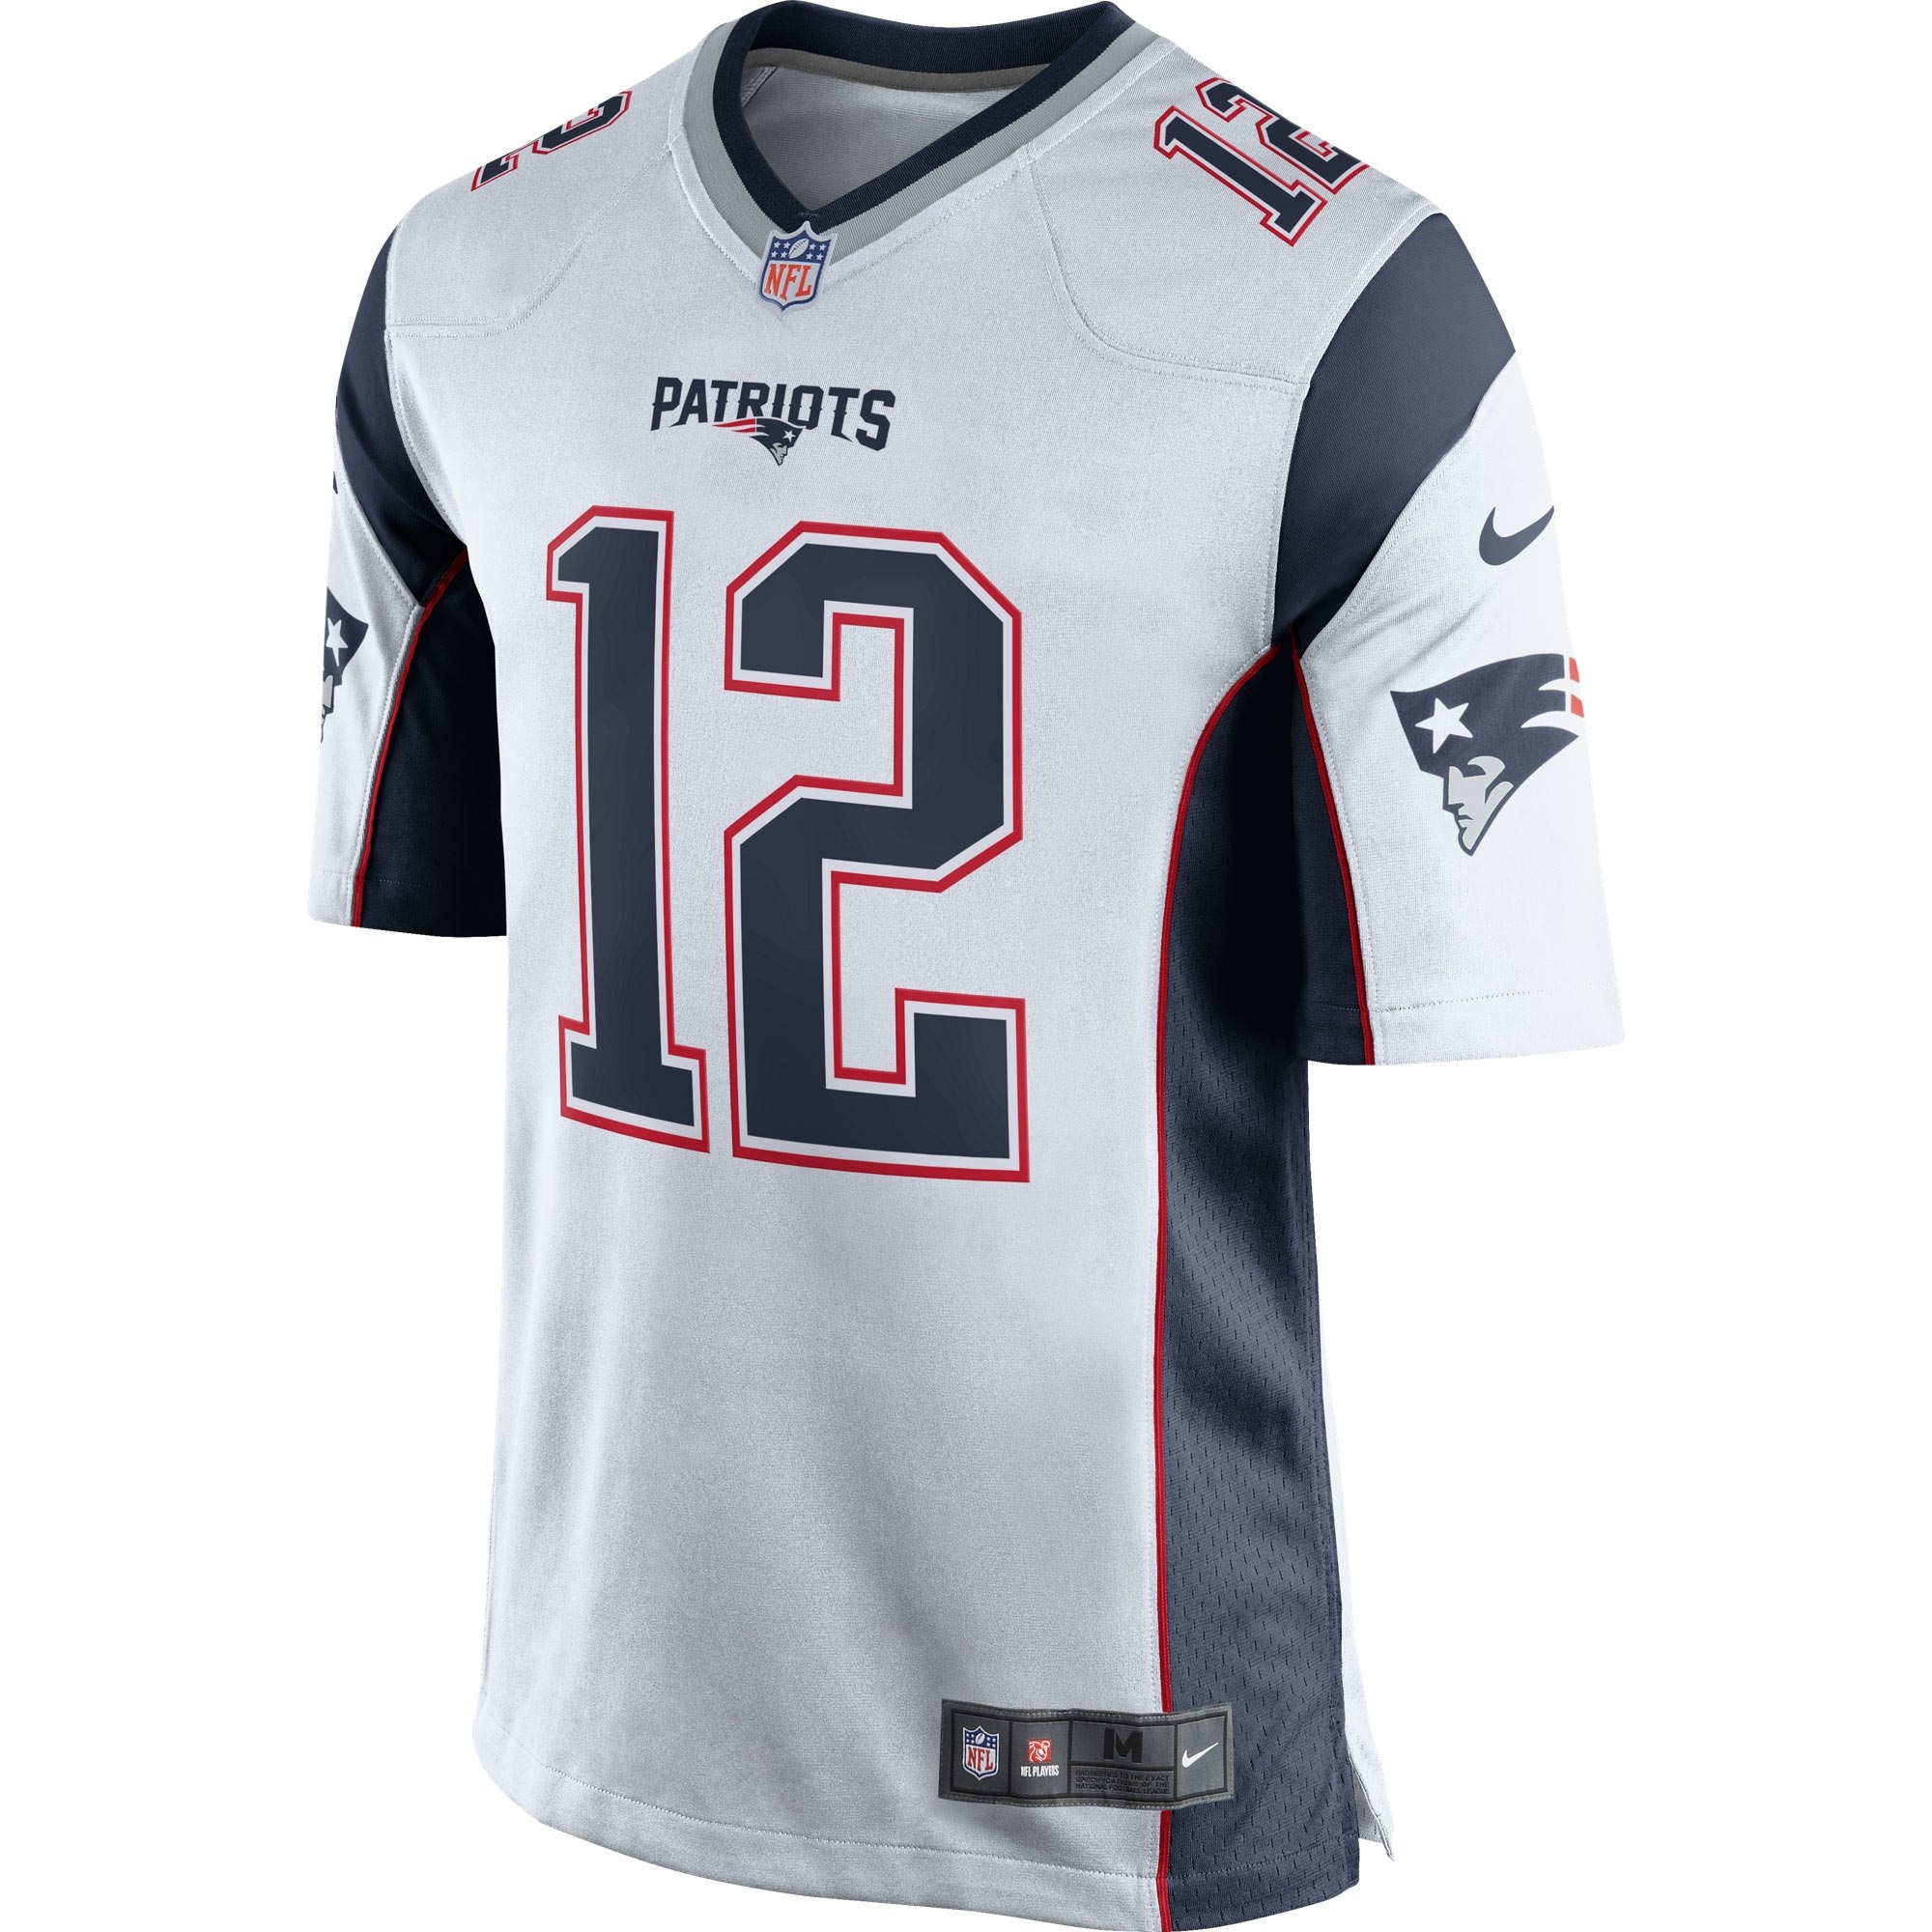 6078bc6da2d NFL Tom Brady New England Patriots Nike On Field Jersey Size 3X-Large